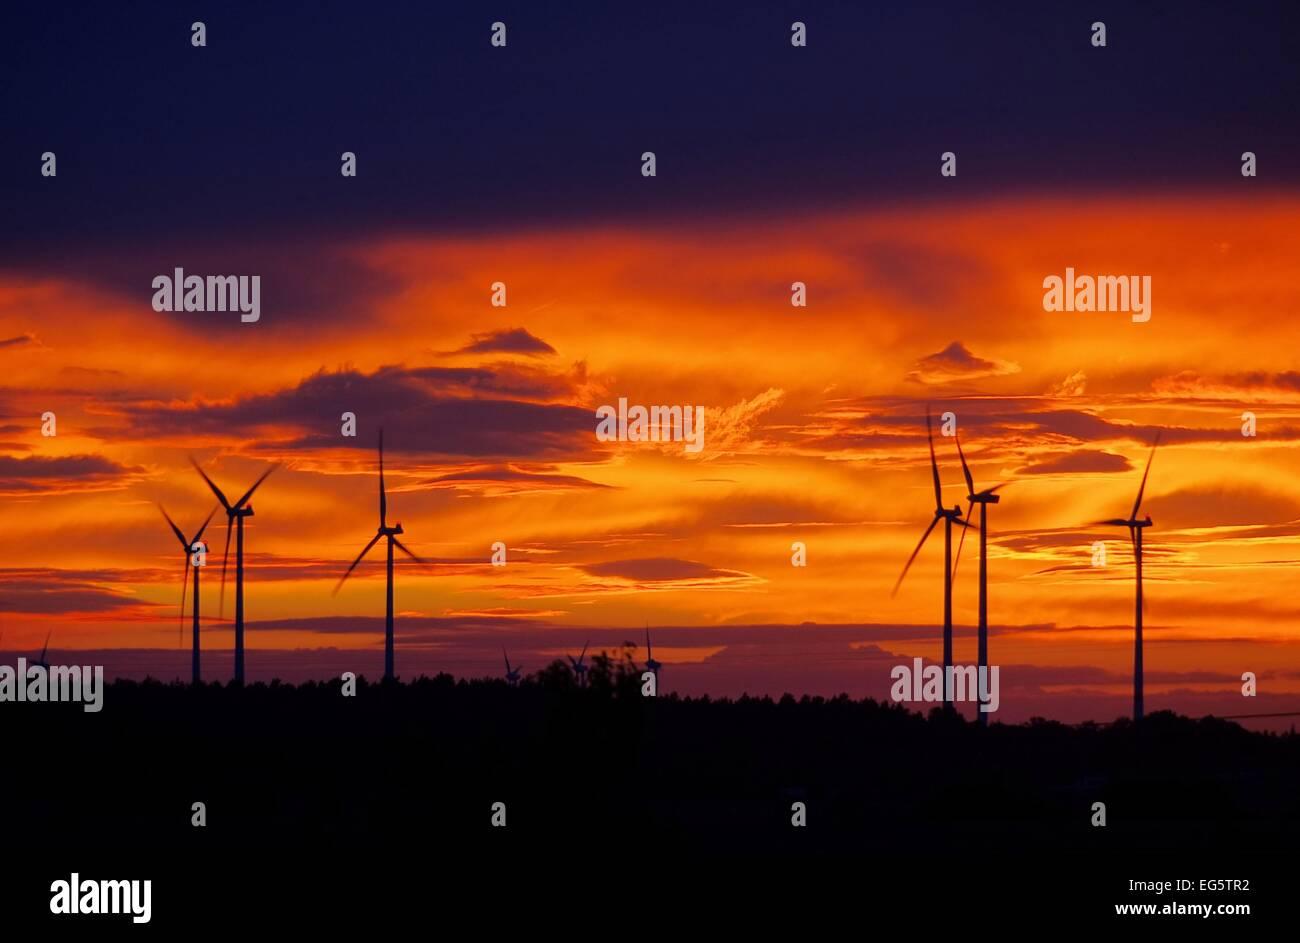 Windrad Sonnenuntergang - wind turbine sunset 01 Photo Stock